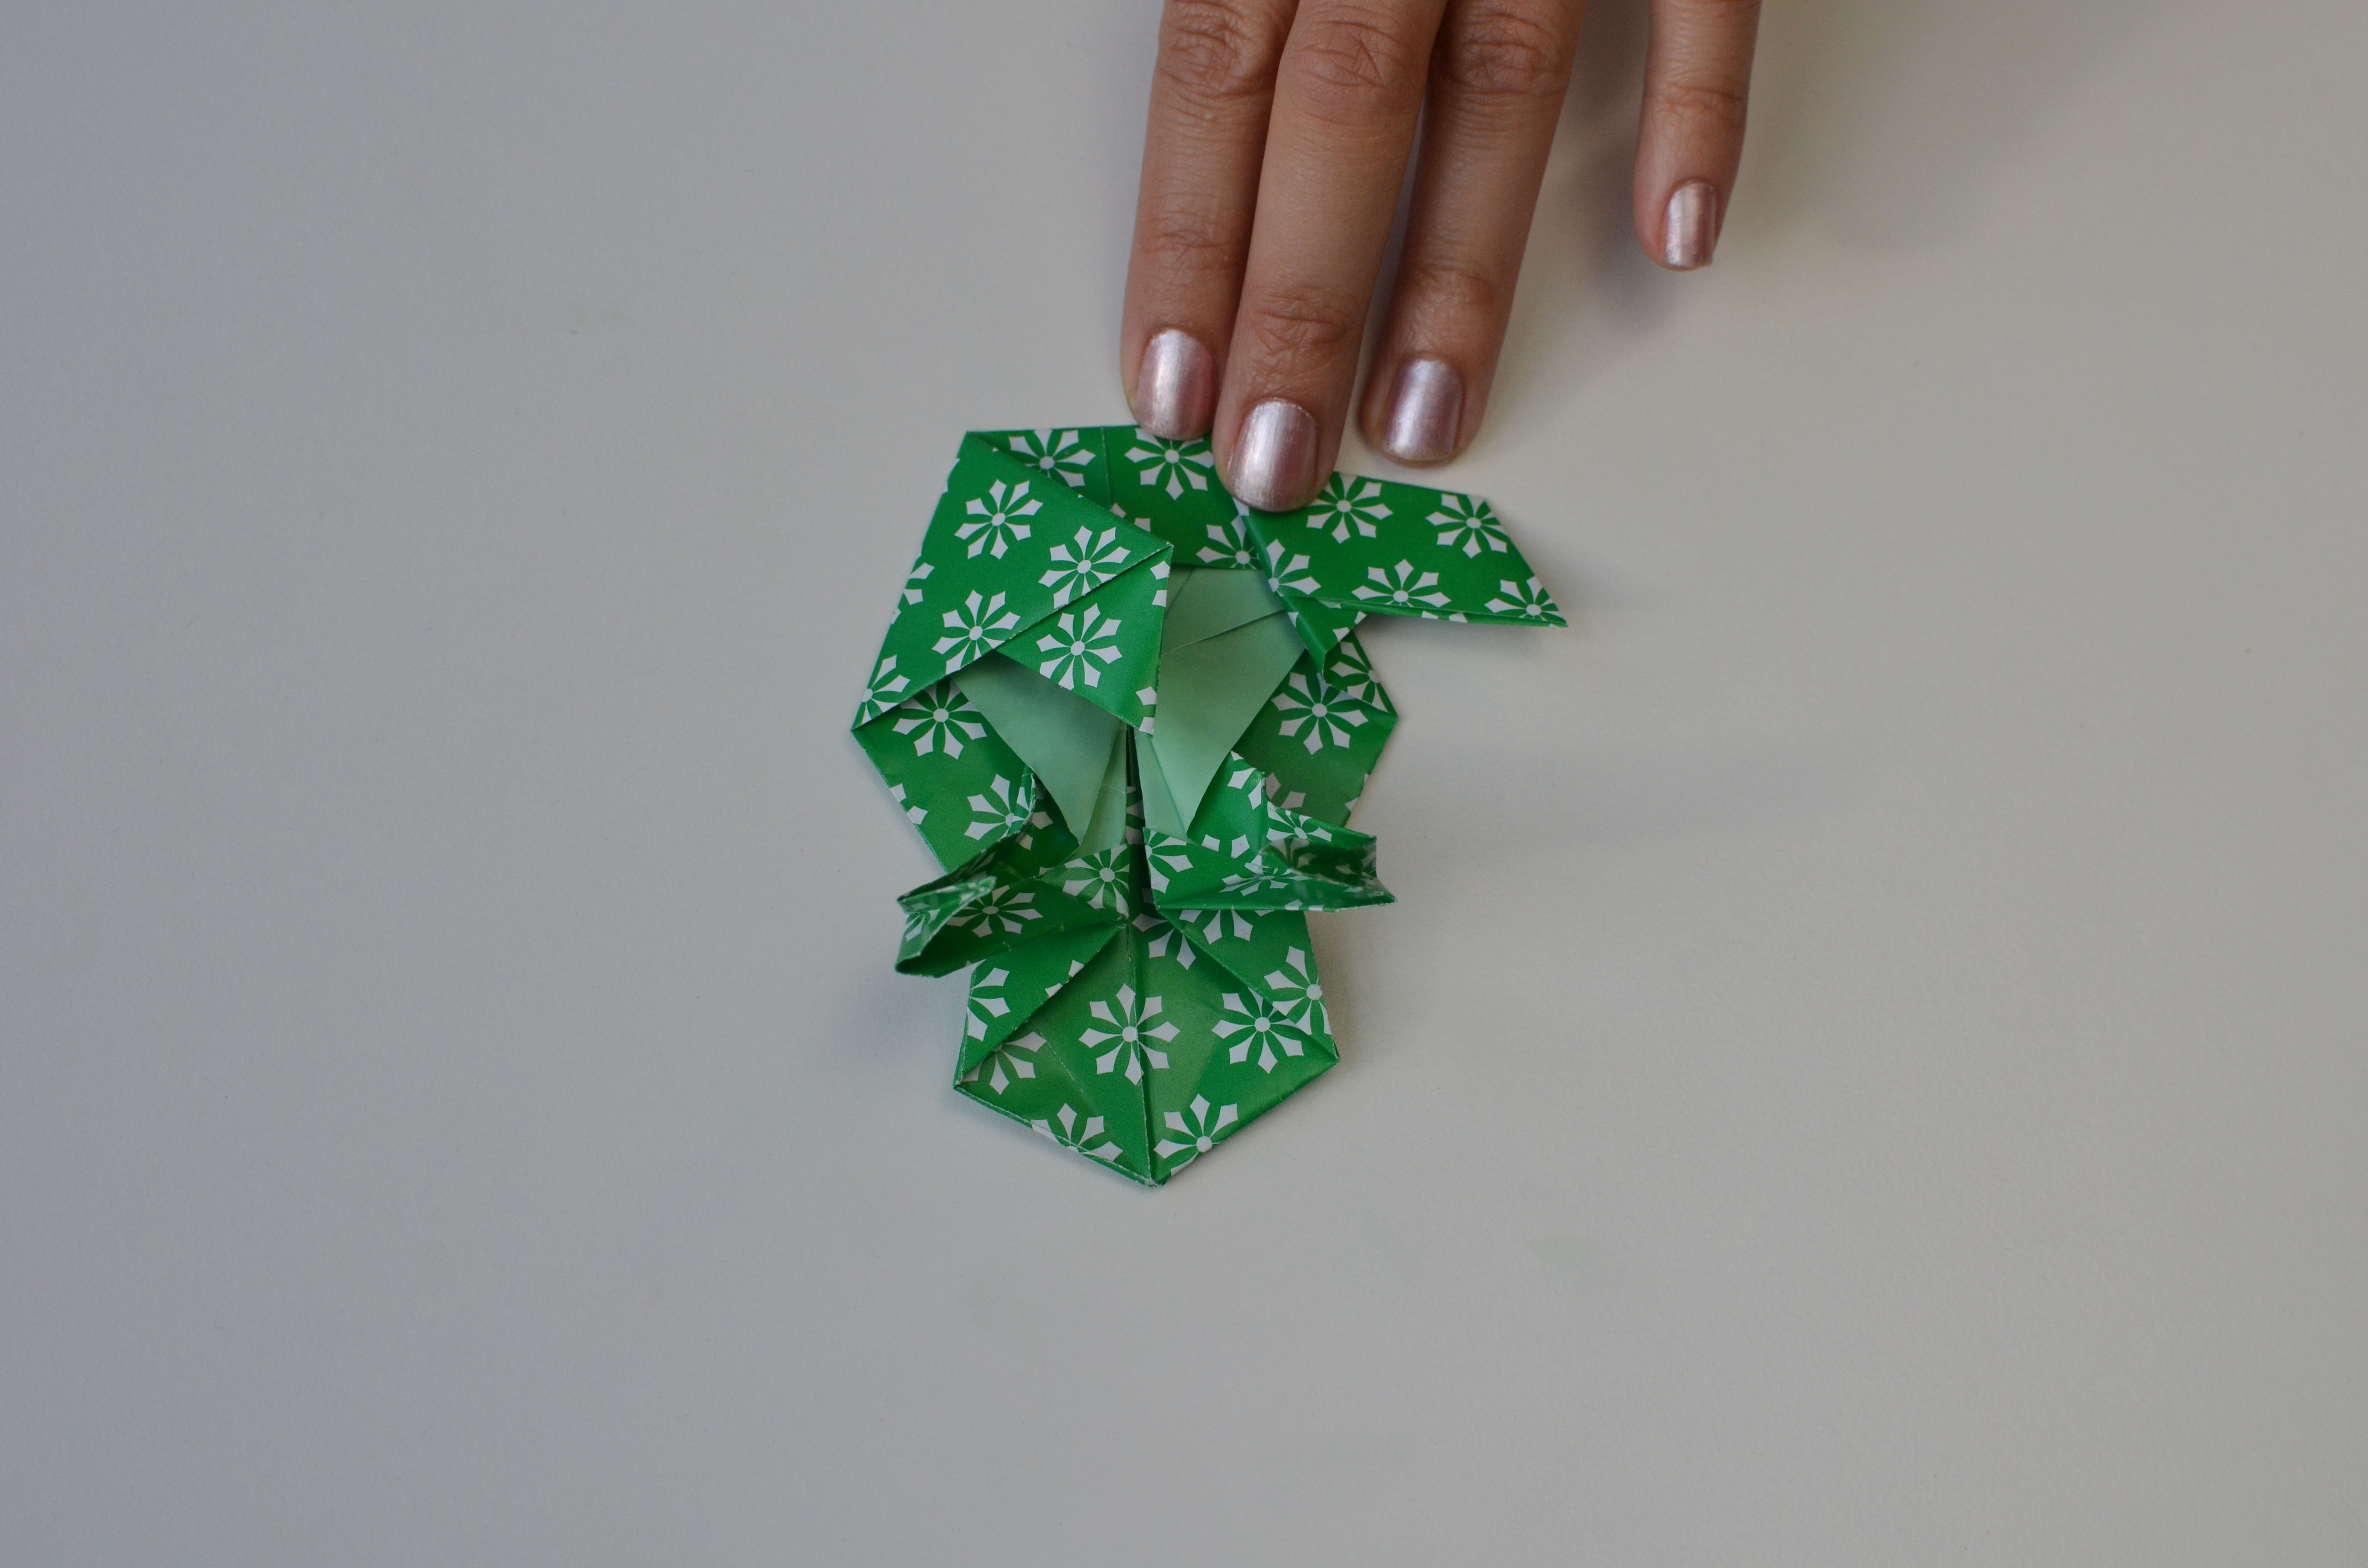 braincrafts_frog_origami_pt53.jpg